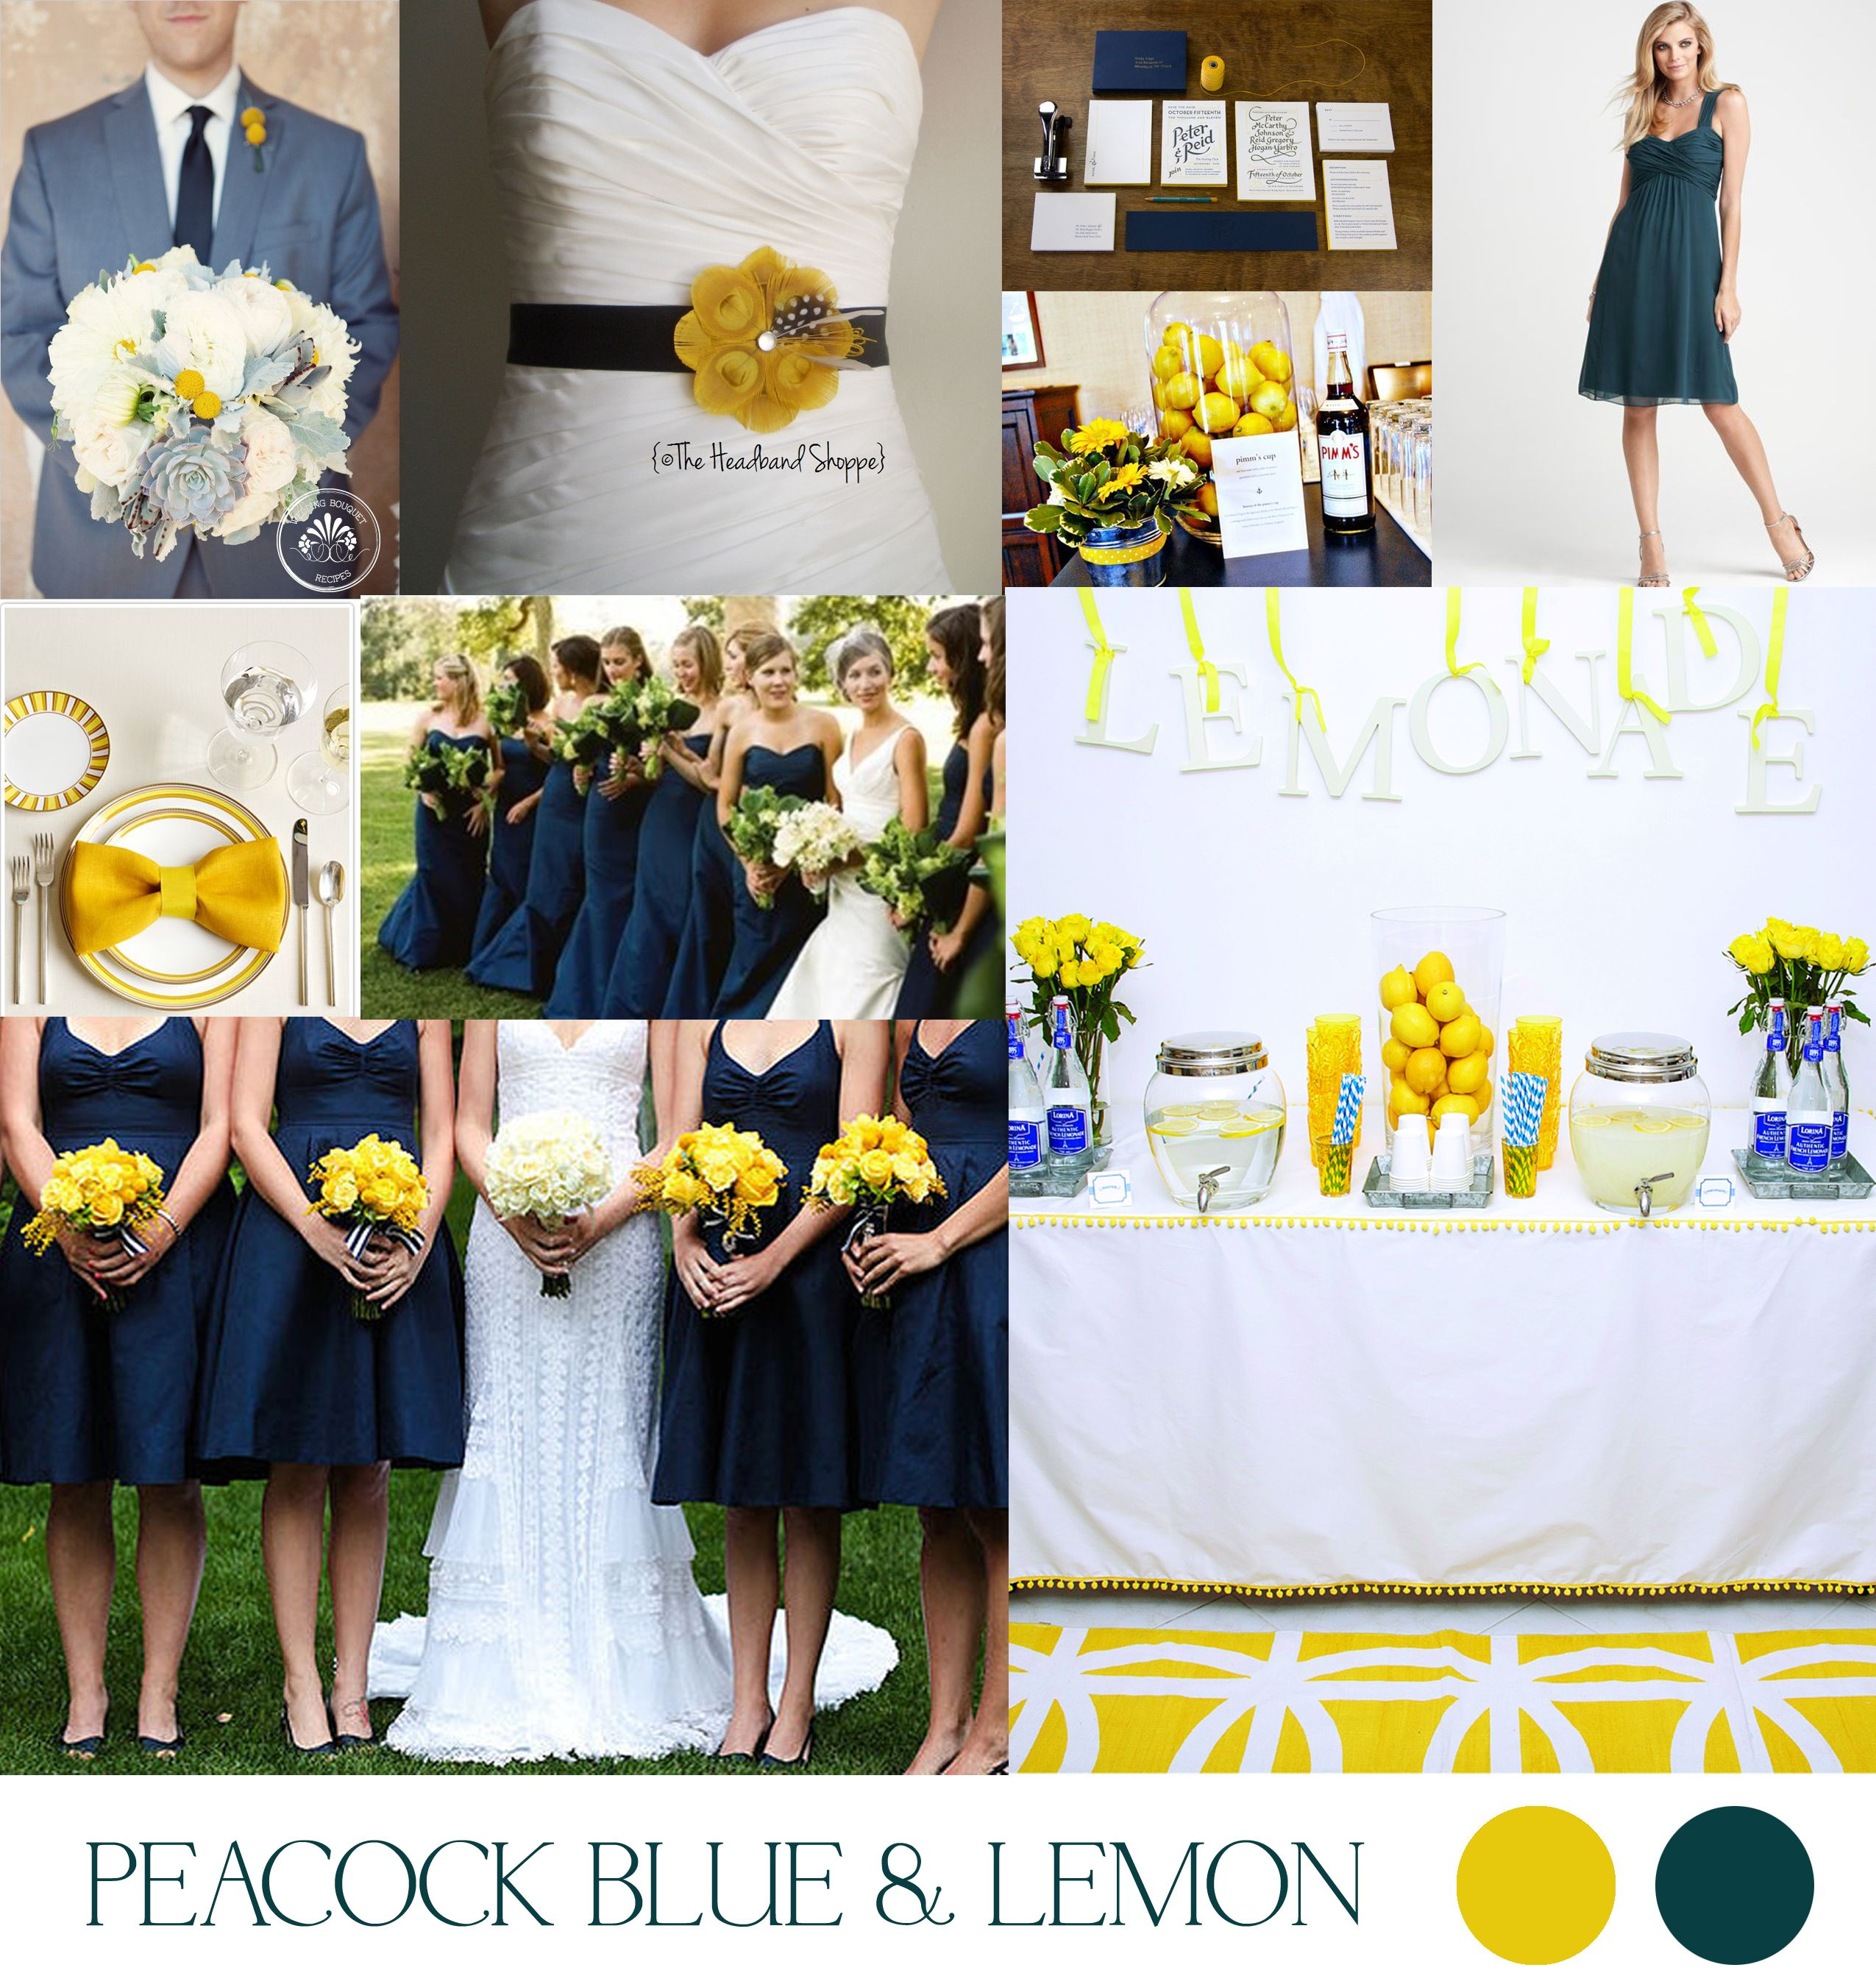 peacock blue and lemon wedding color palette